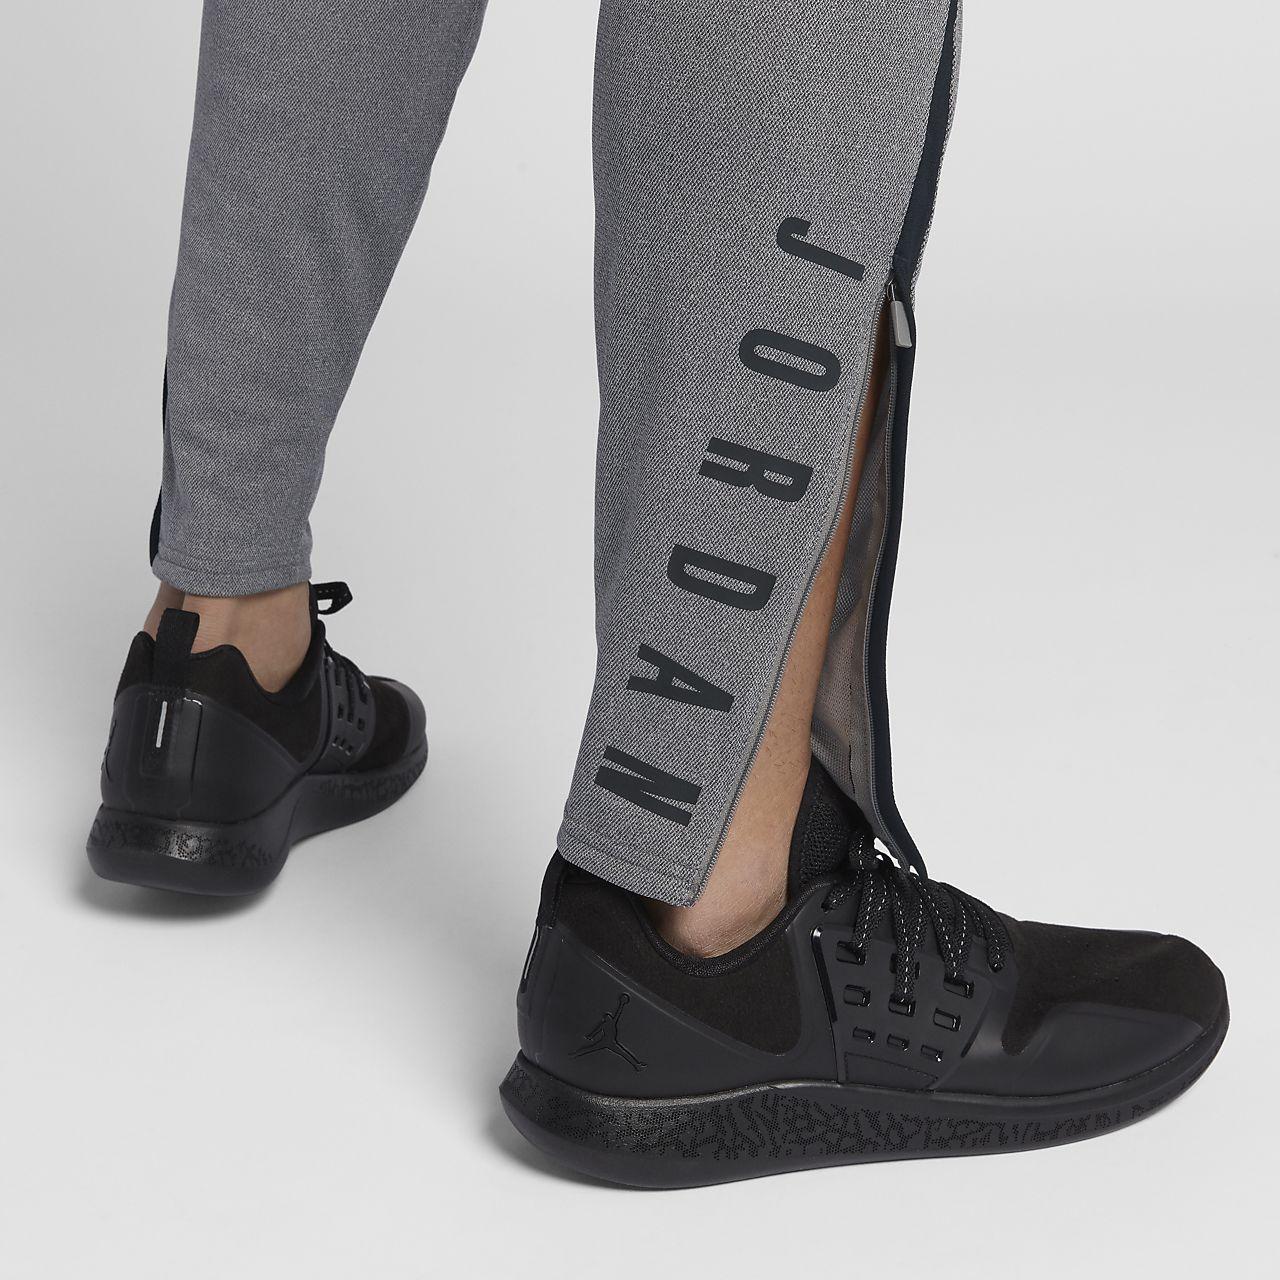 d8adc74a3dc Jordan Dri-FIT 23 Alpha Men's Basketball Trousers. Nike.com IN